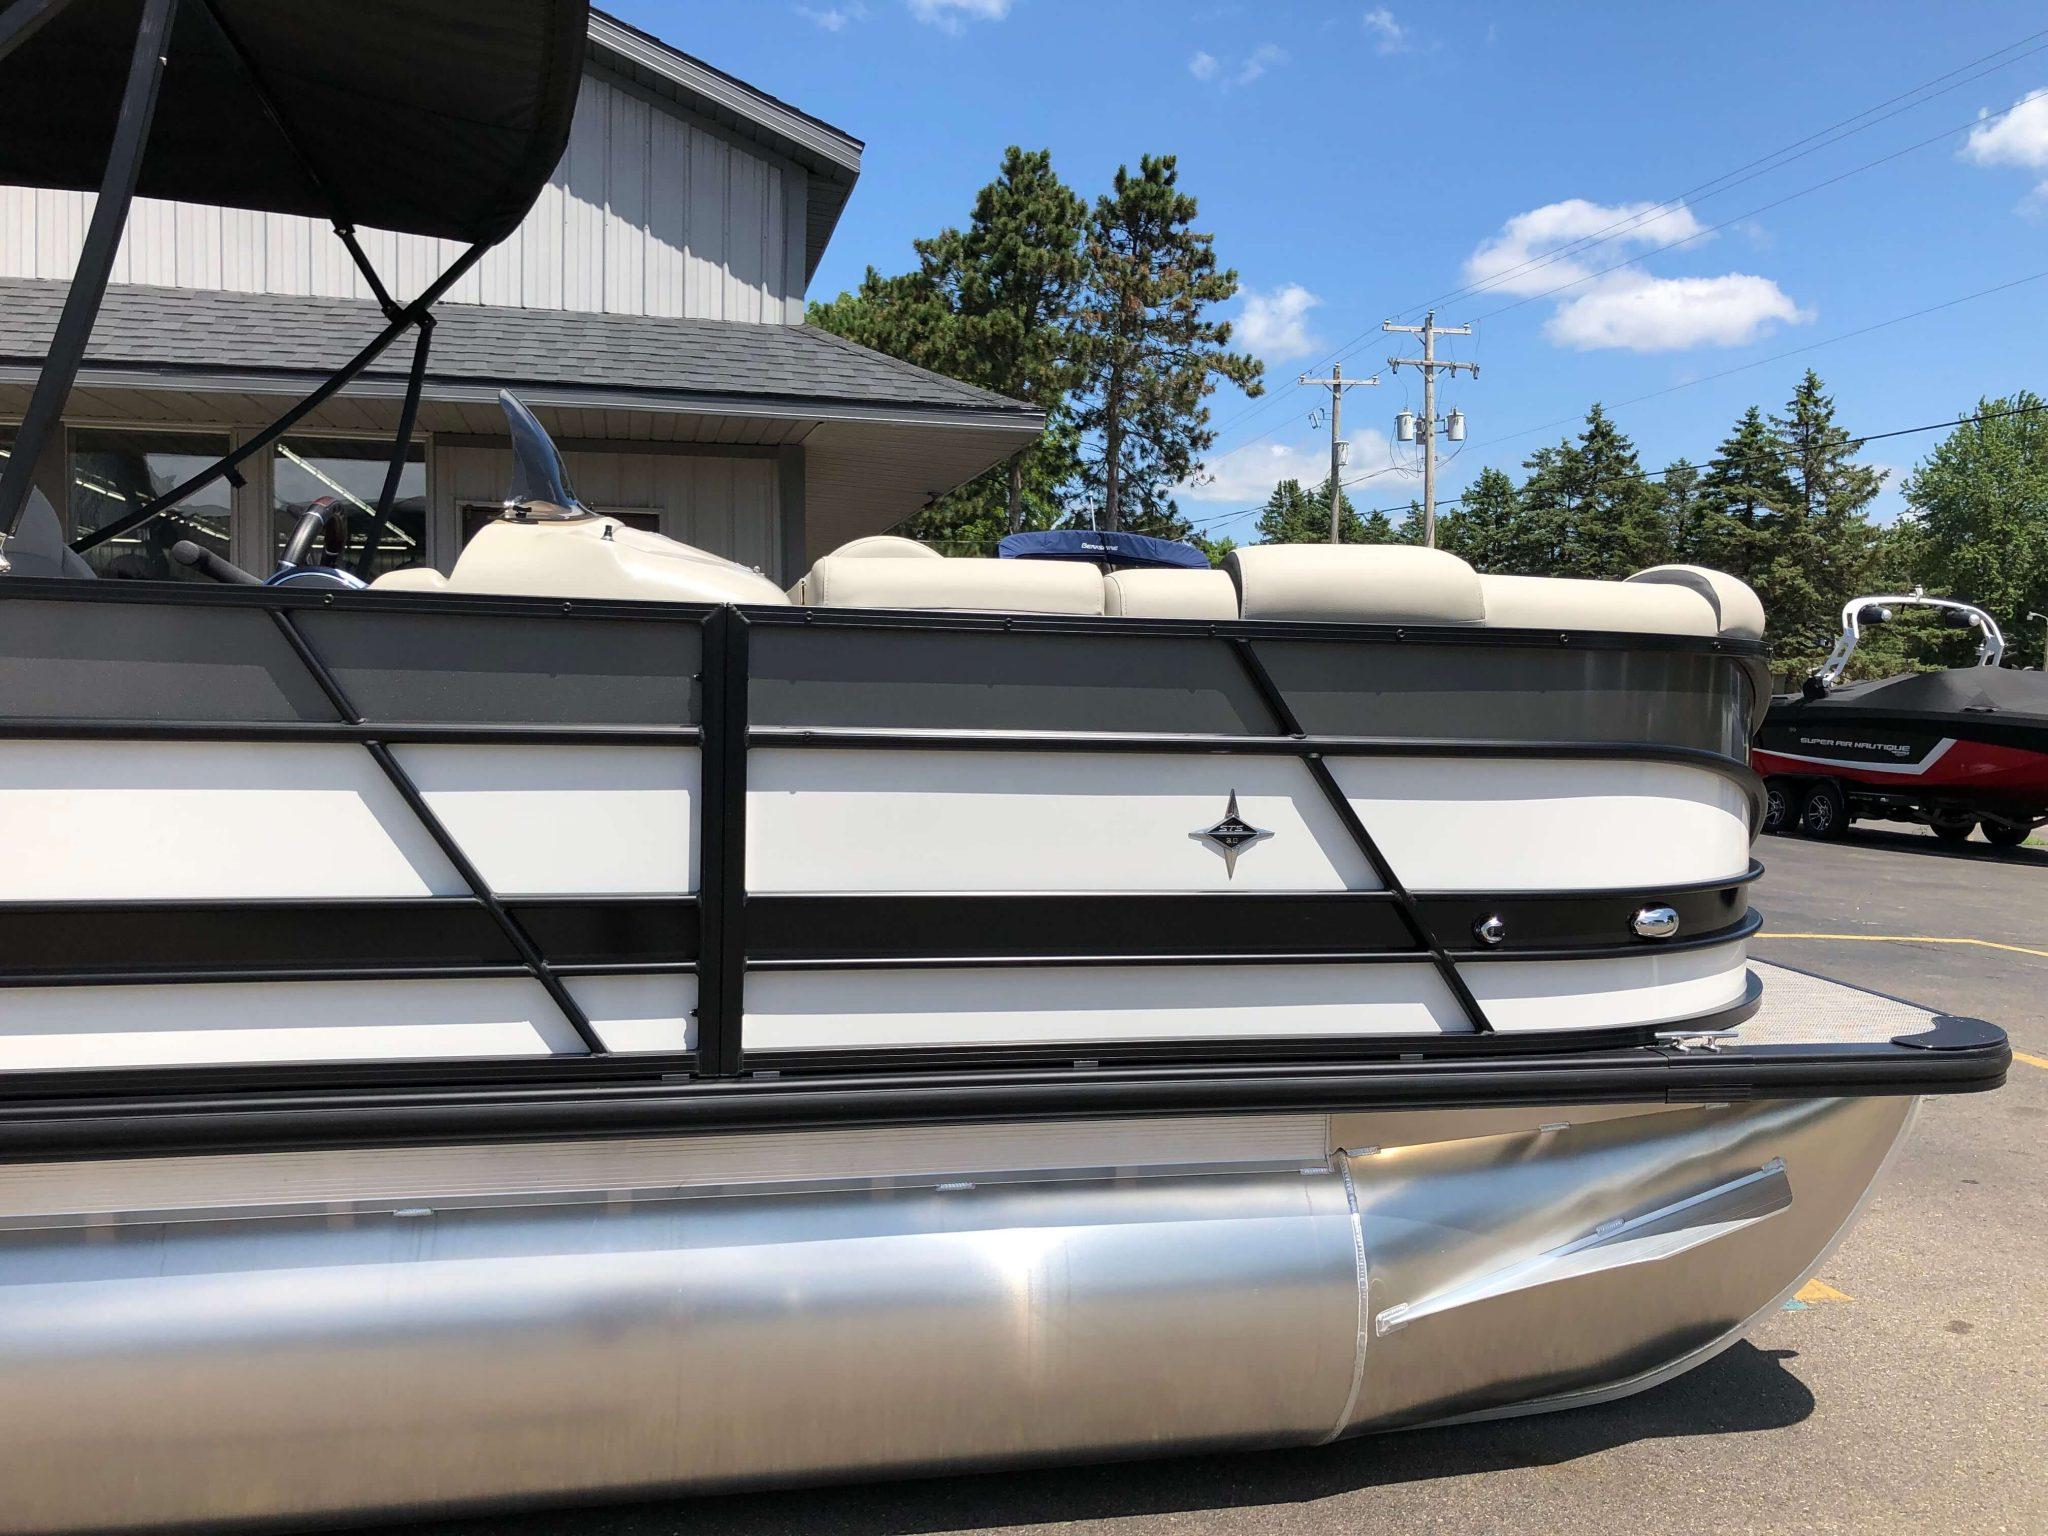 2019 Berkshire 23RFX STS Pontoon Boat 4